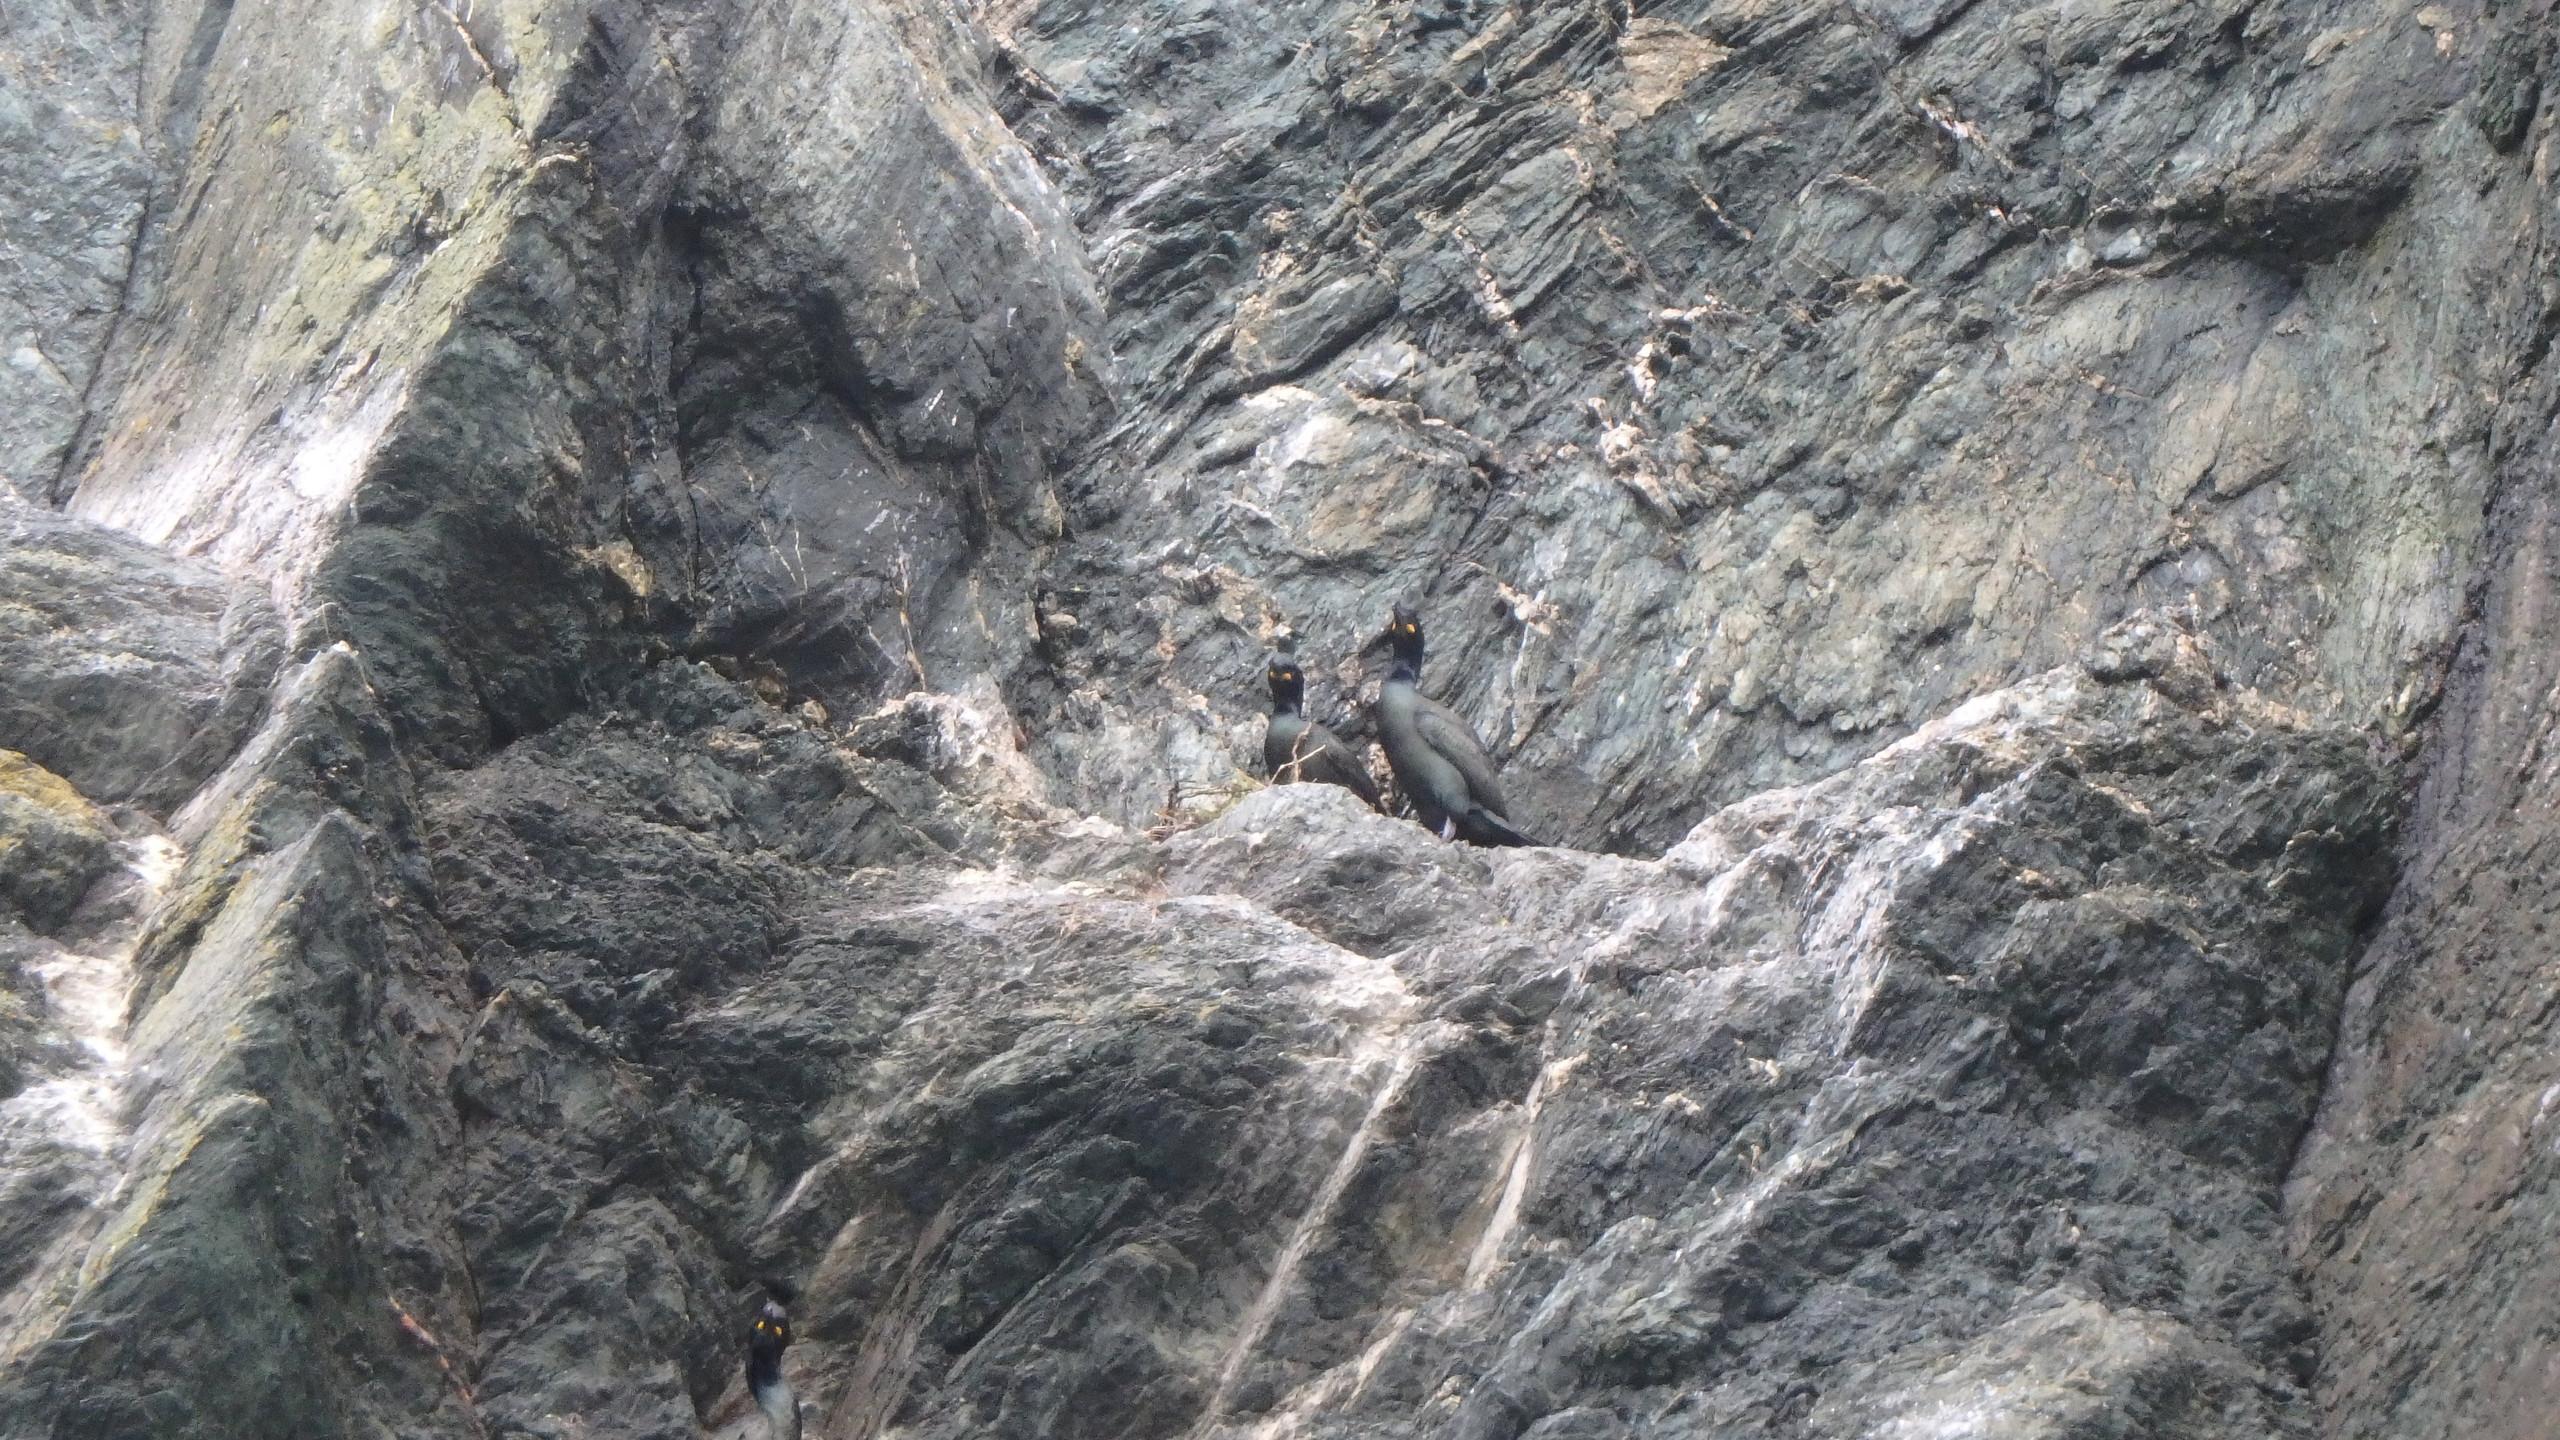 Phalocrocorax aristotelis